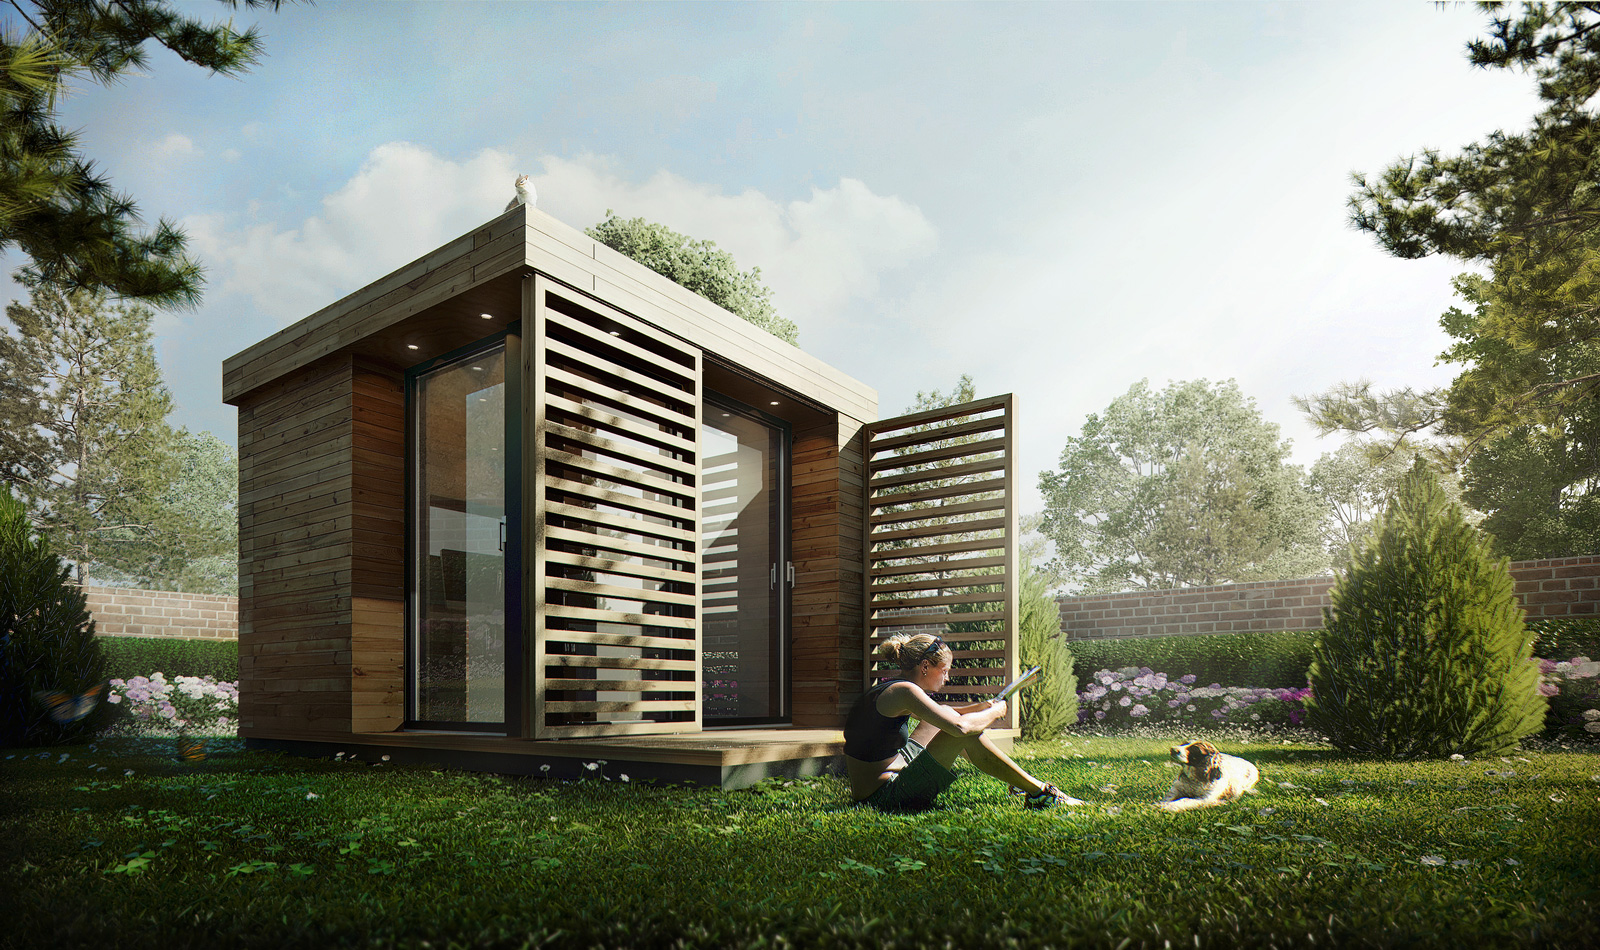 3d Visualization Garden Office Architectural Visualization Studio Mer Ces Arch Design